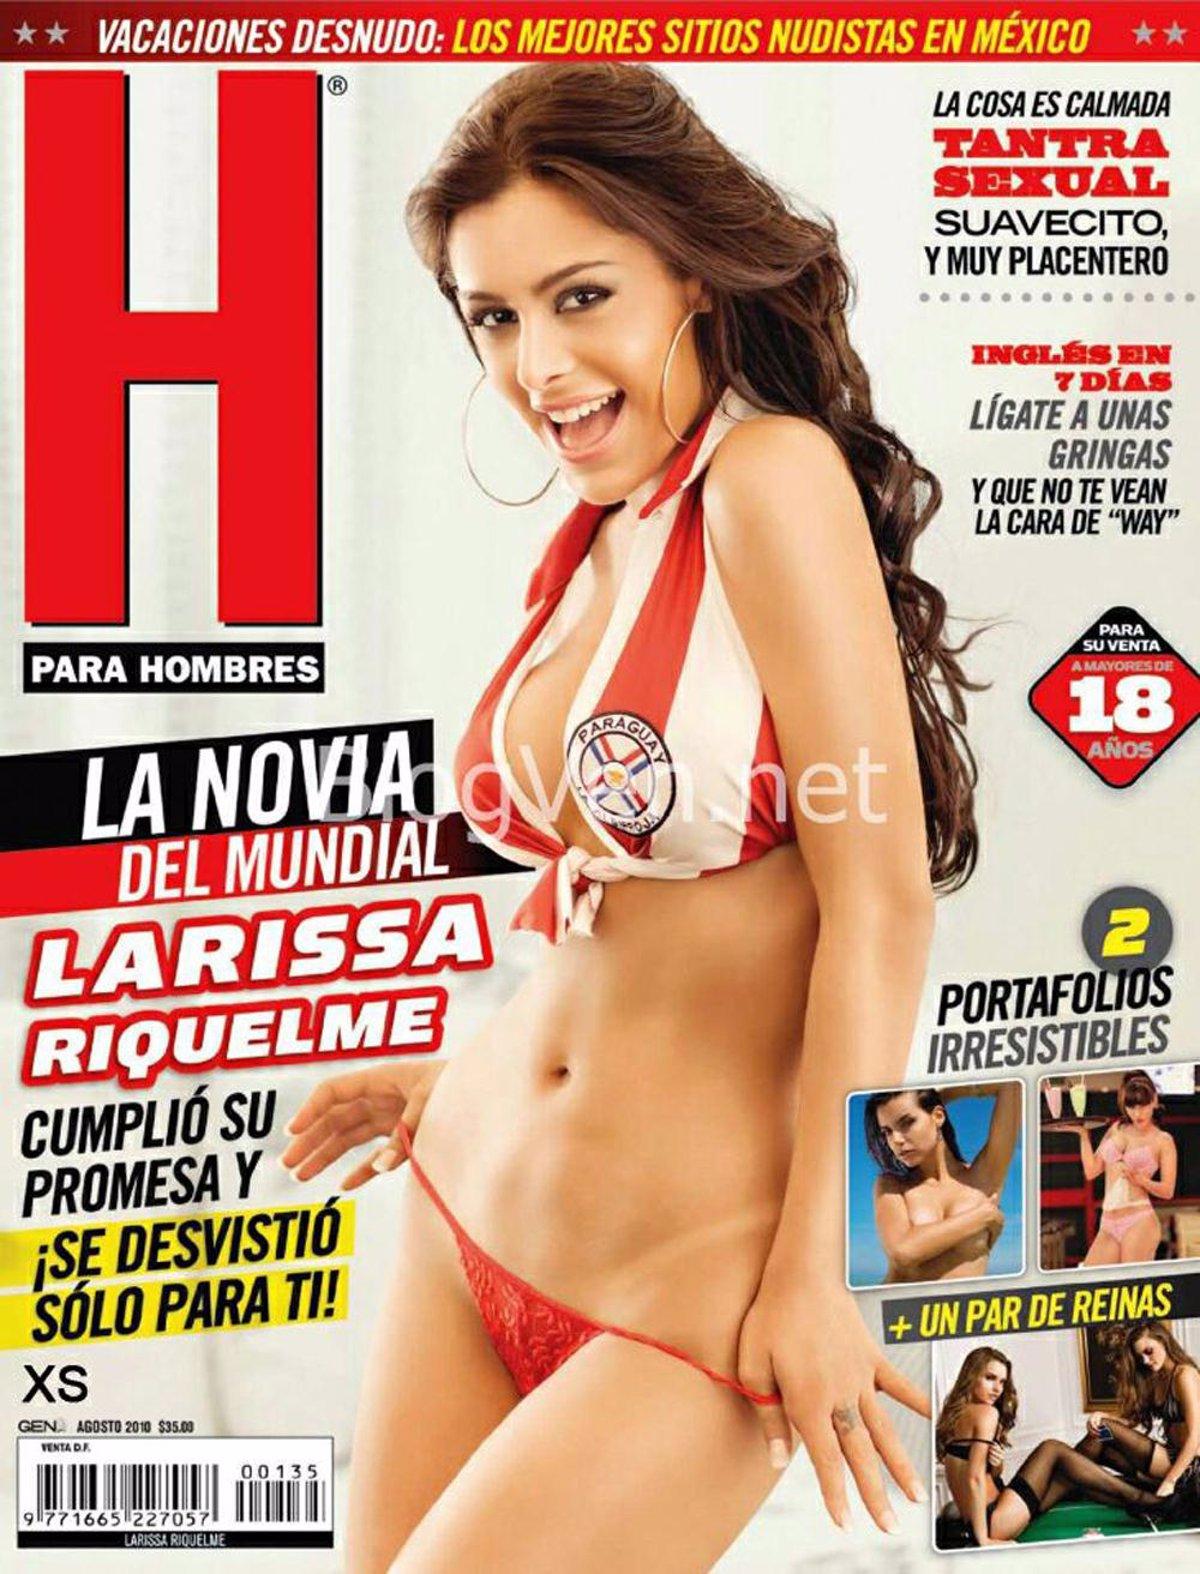 Larrisa Riquelme La Novia Del Mundial Otra Vez Desnuda